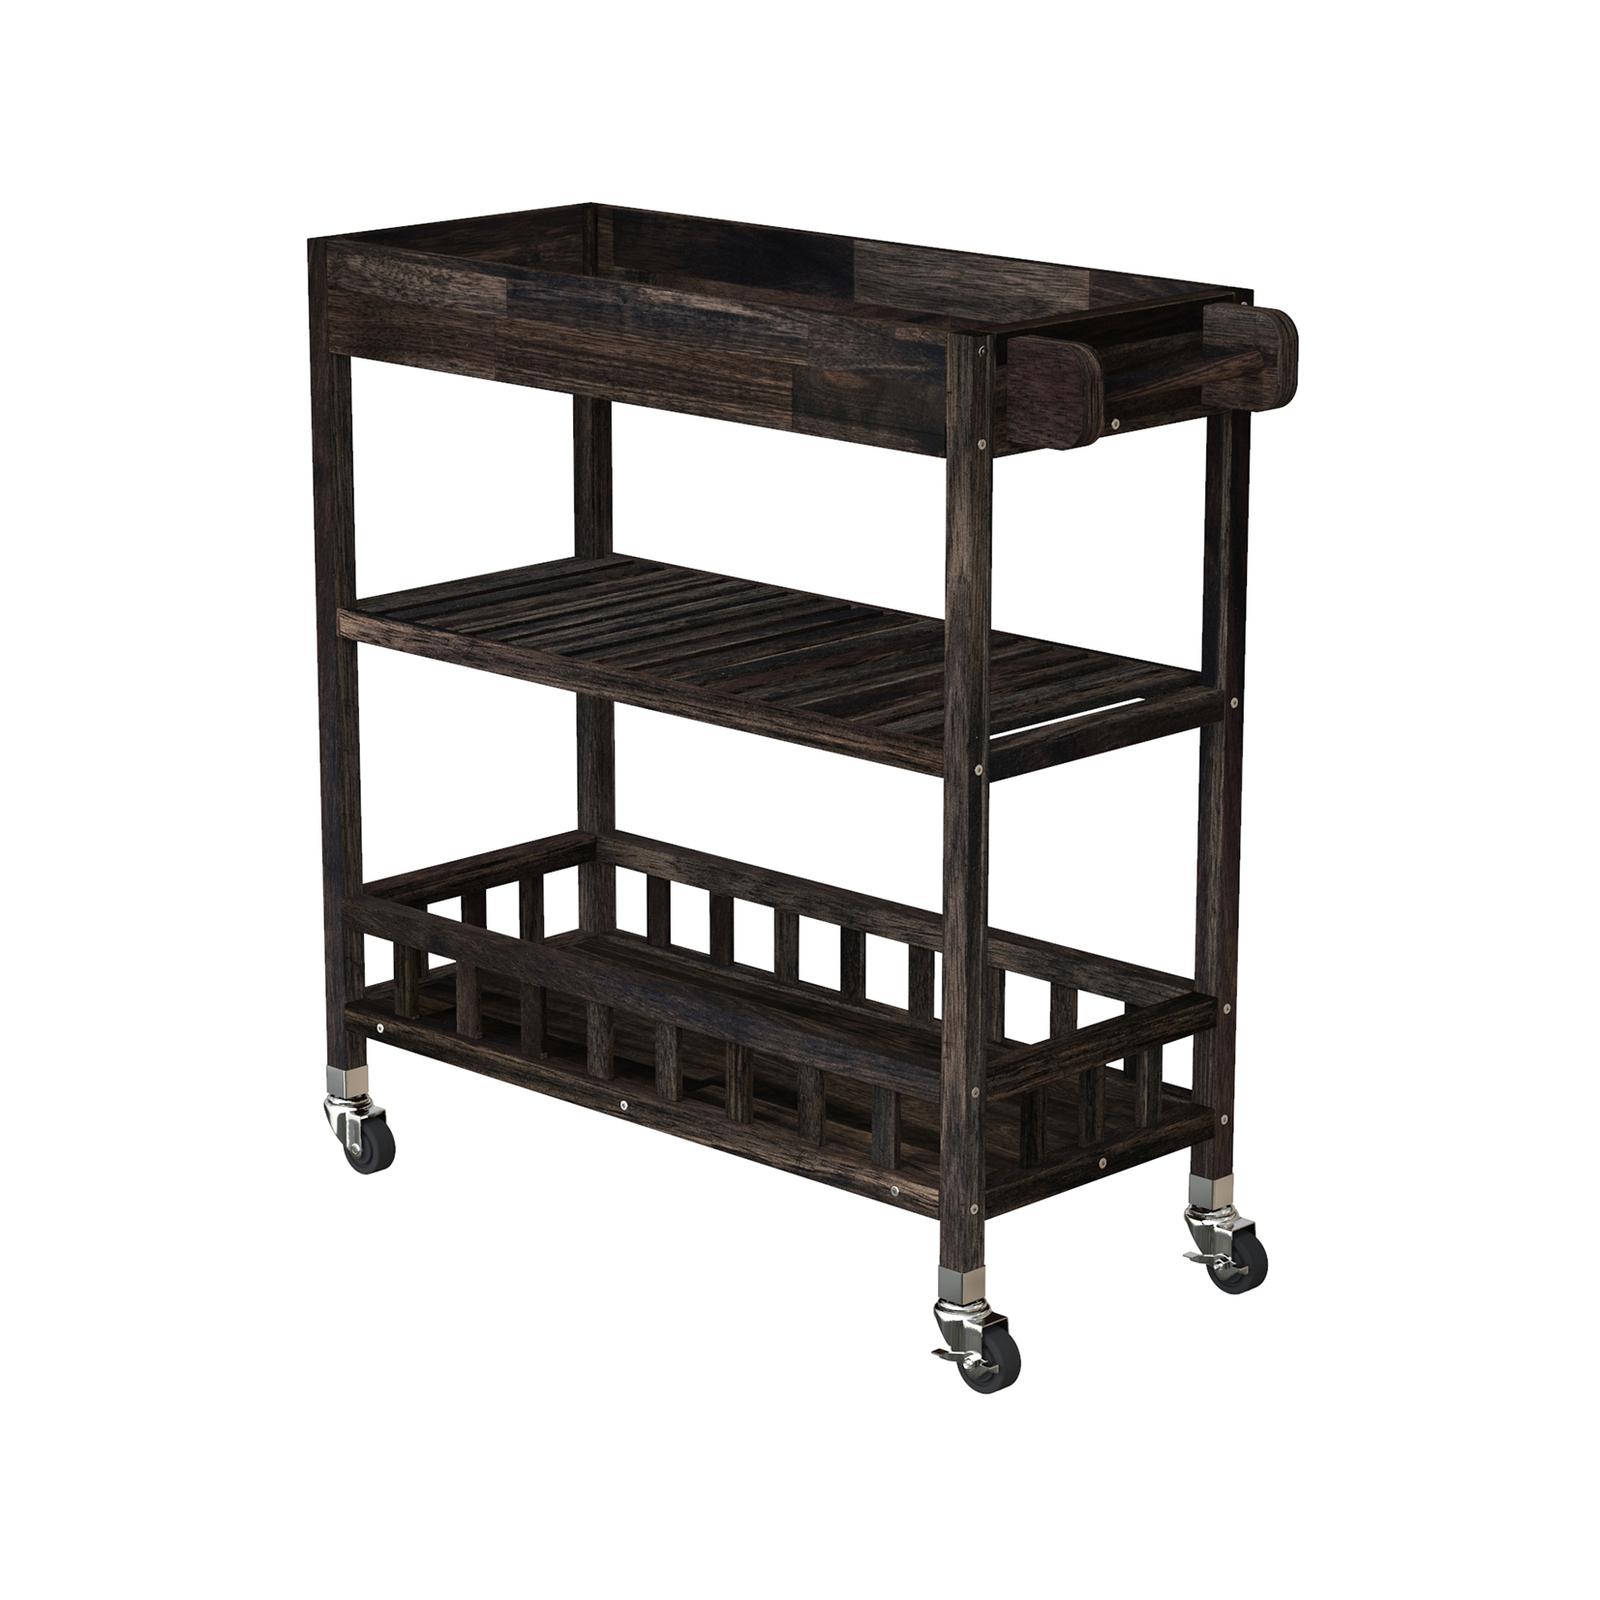 Interbuild 80 x 35 x 85cm Espresso Holger SUV Kitchen Cart